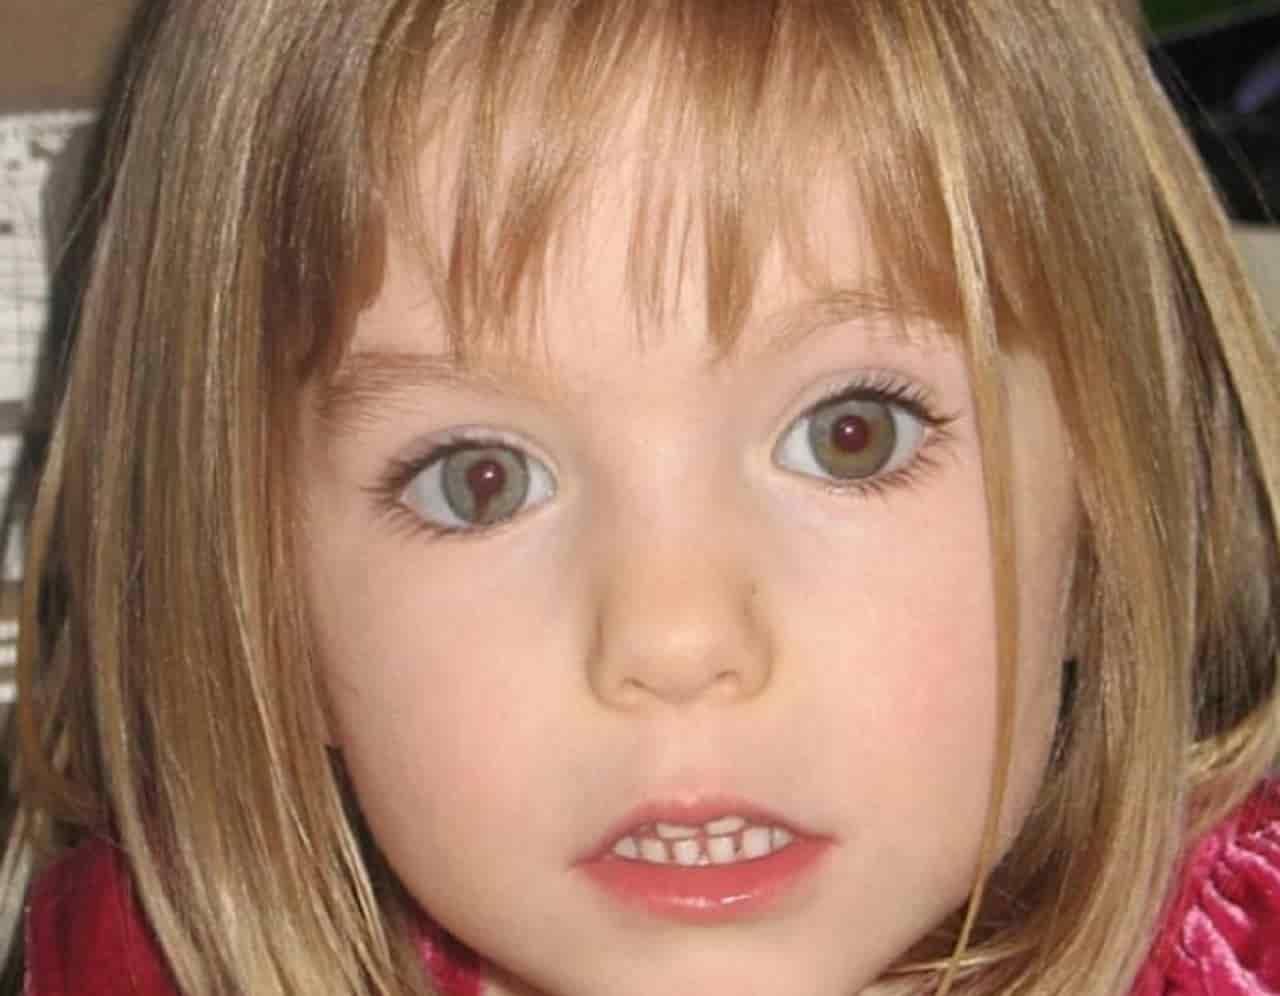 scomparsa Maddie McCann